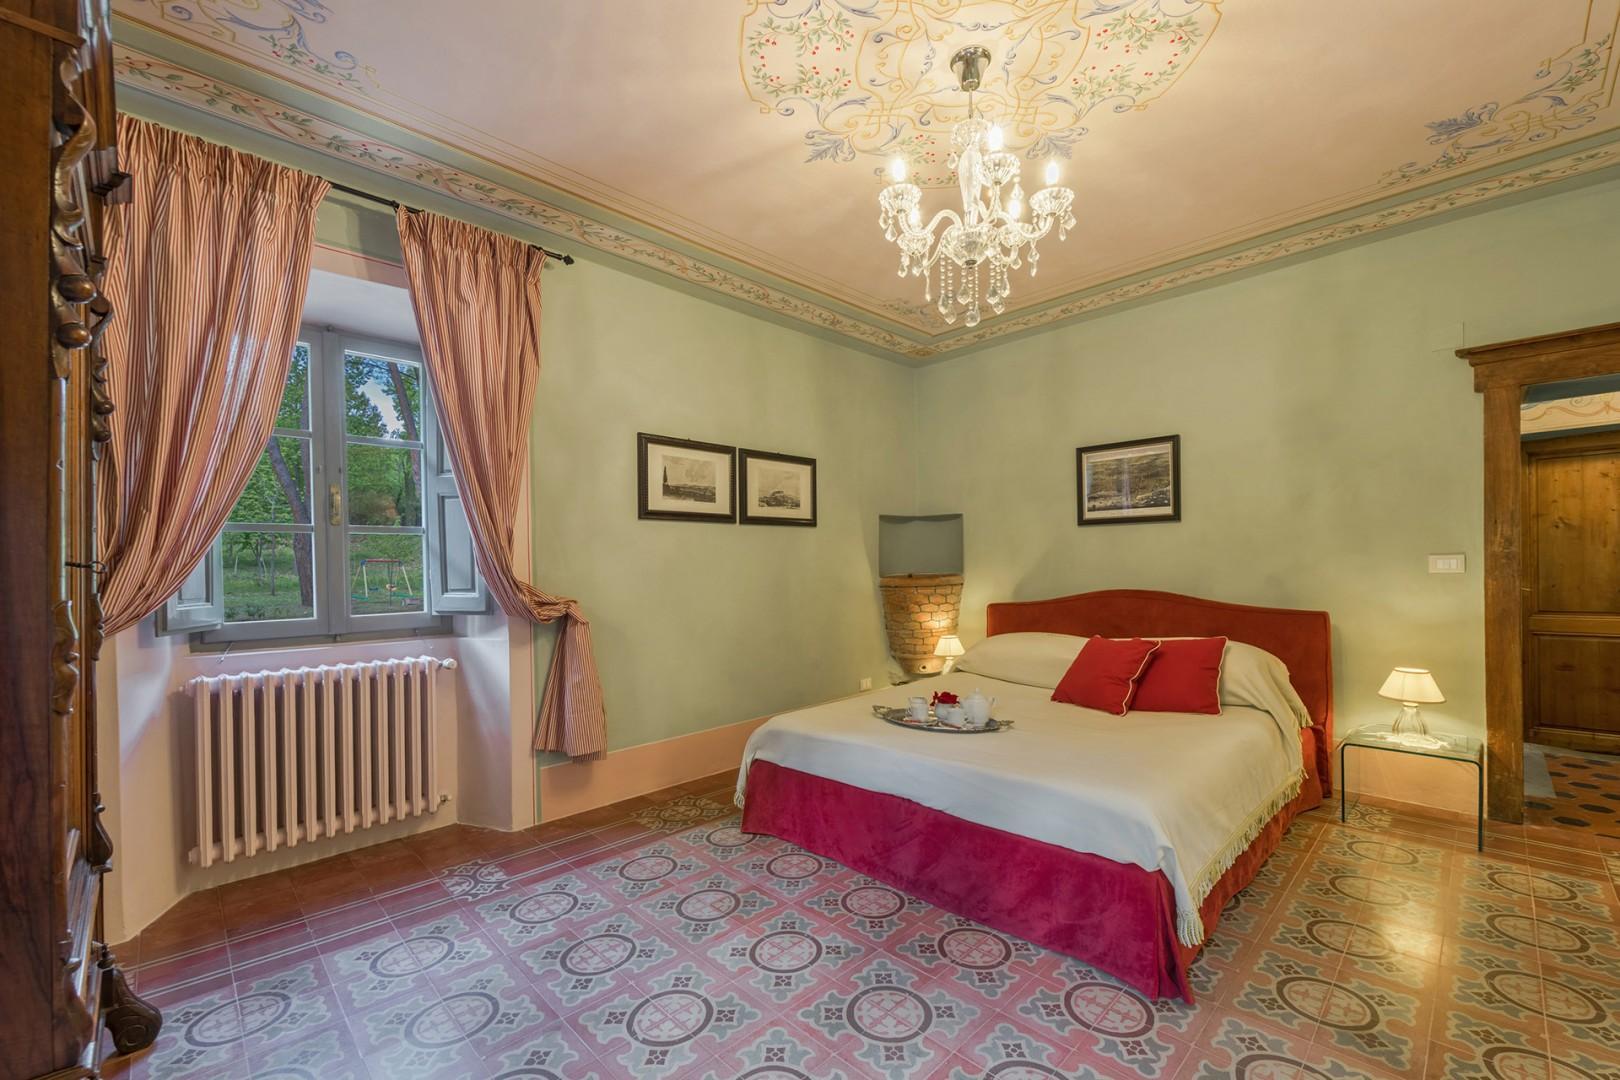 Bedroom 6 has an en suite bathroom and private balcony.